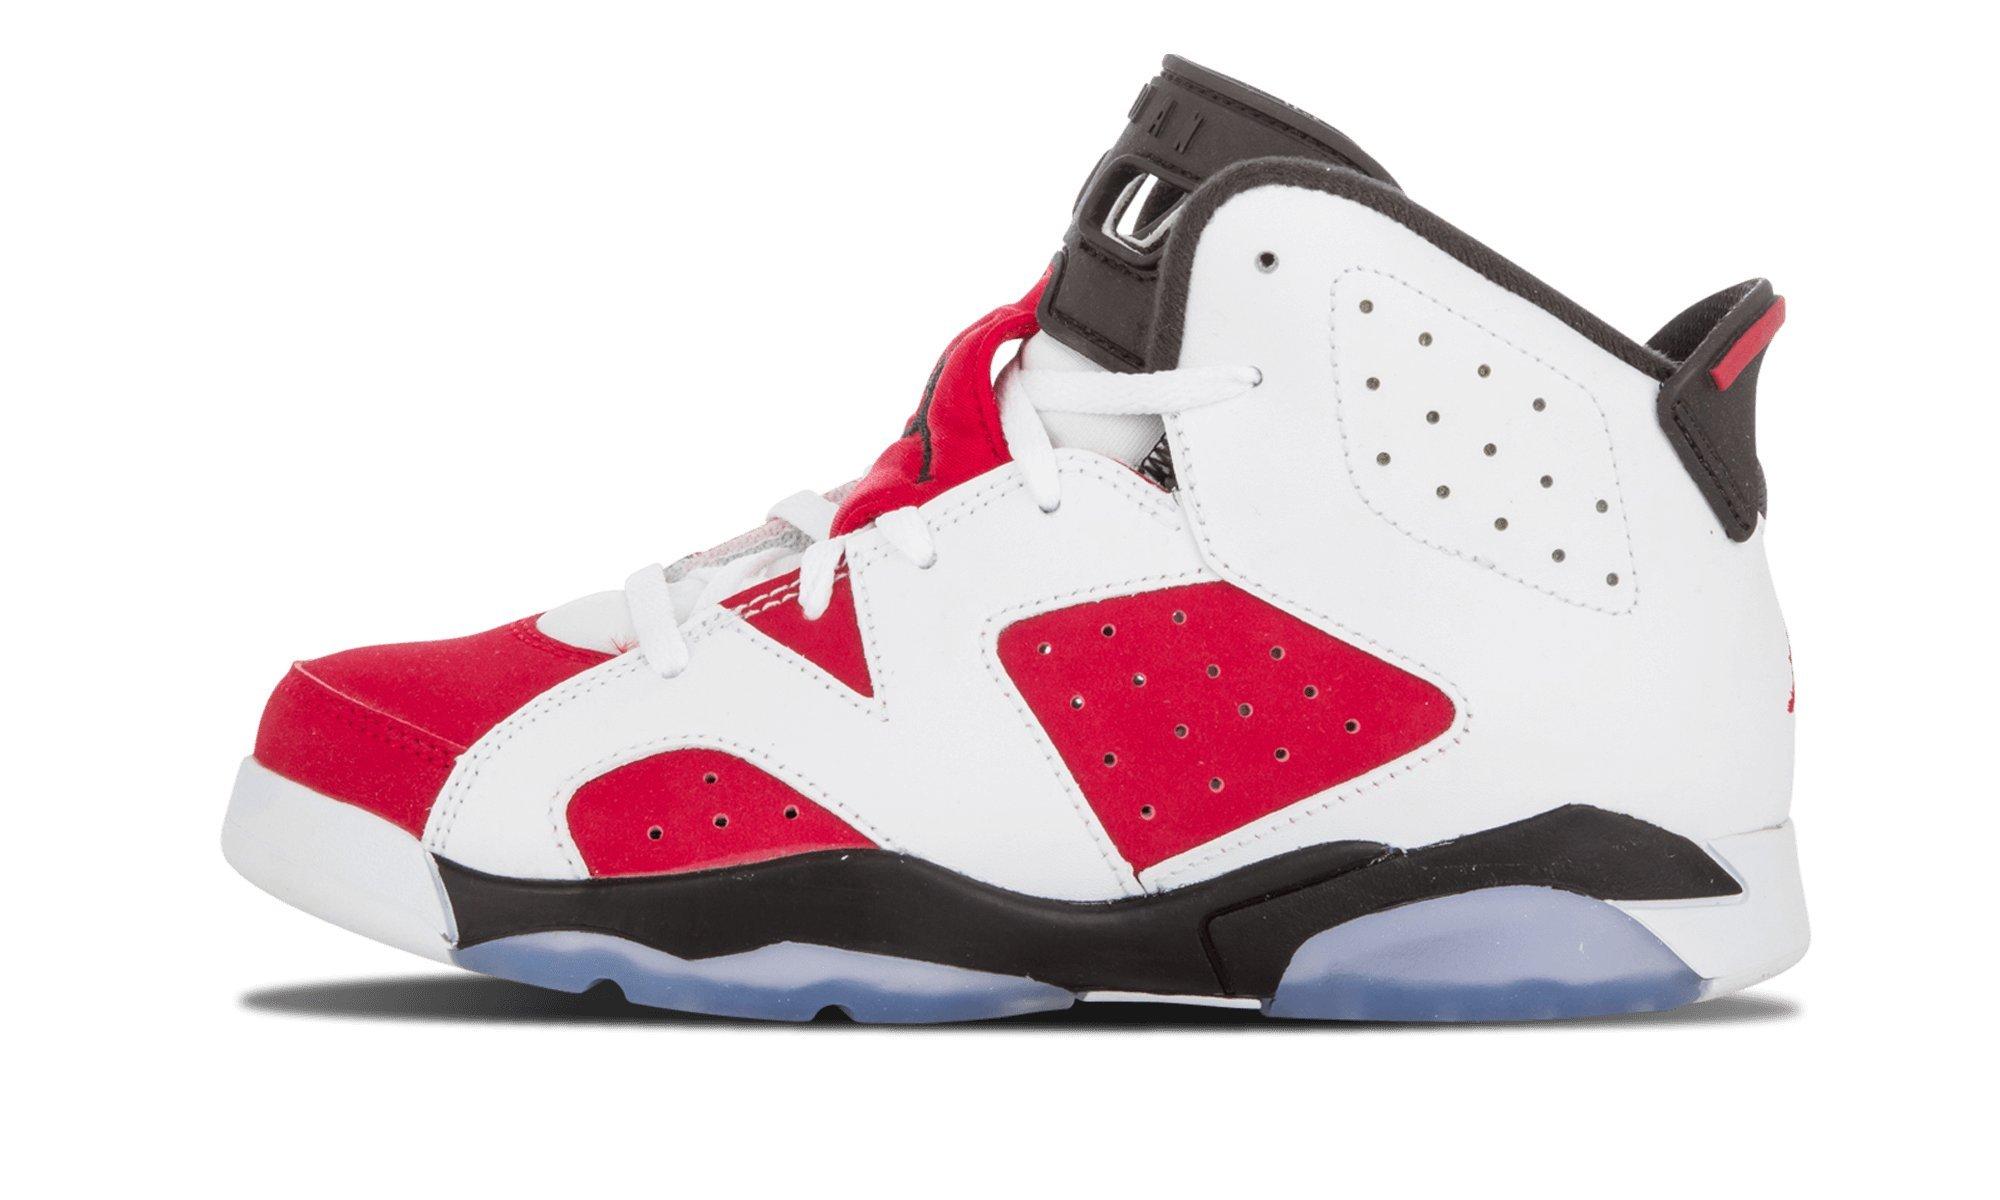 Air Jordan Retro 6 BP Little Kids Shoes White/Carmine-Black 384666-160 (2 M US)